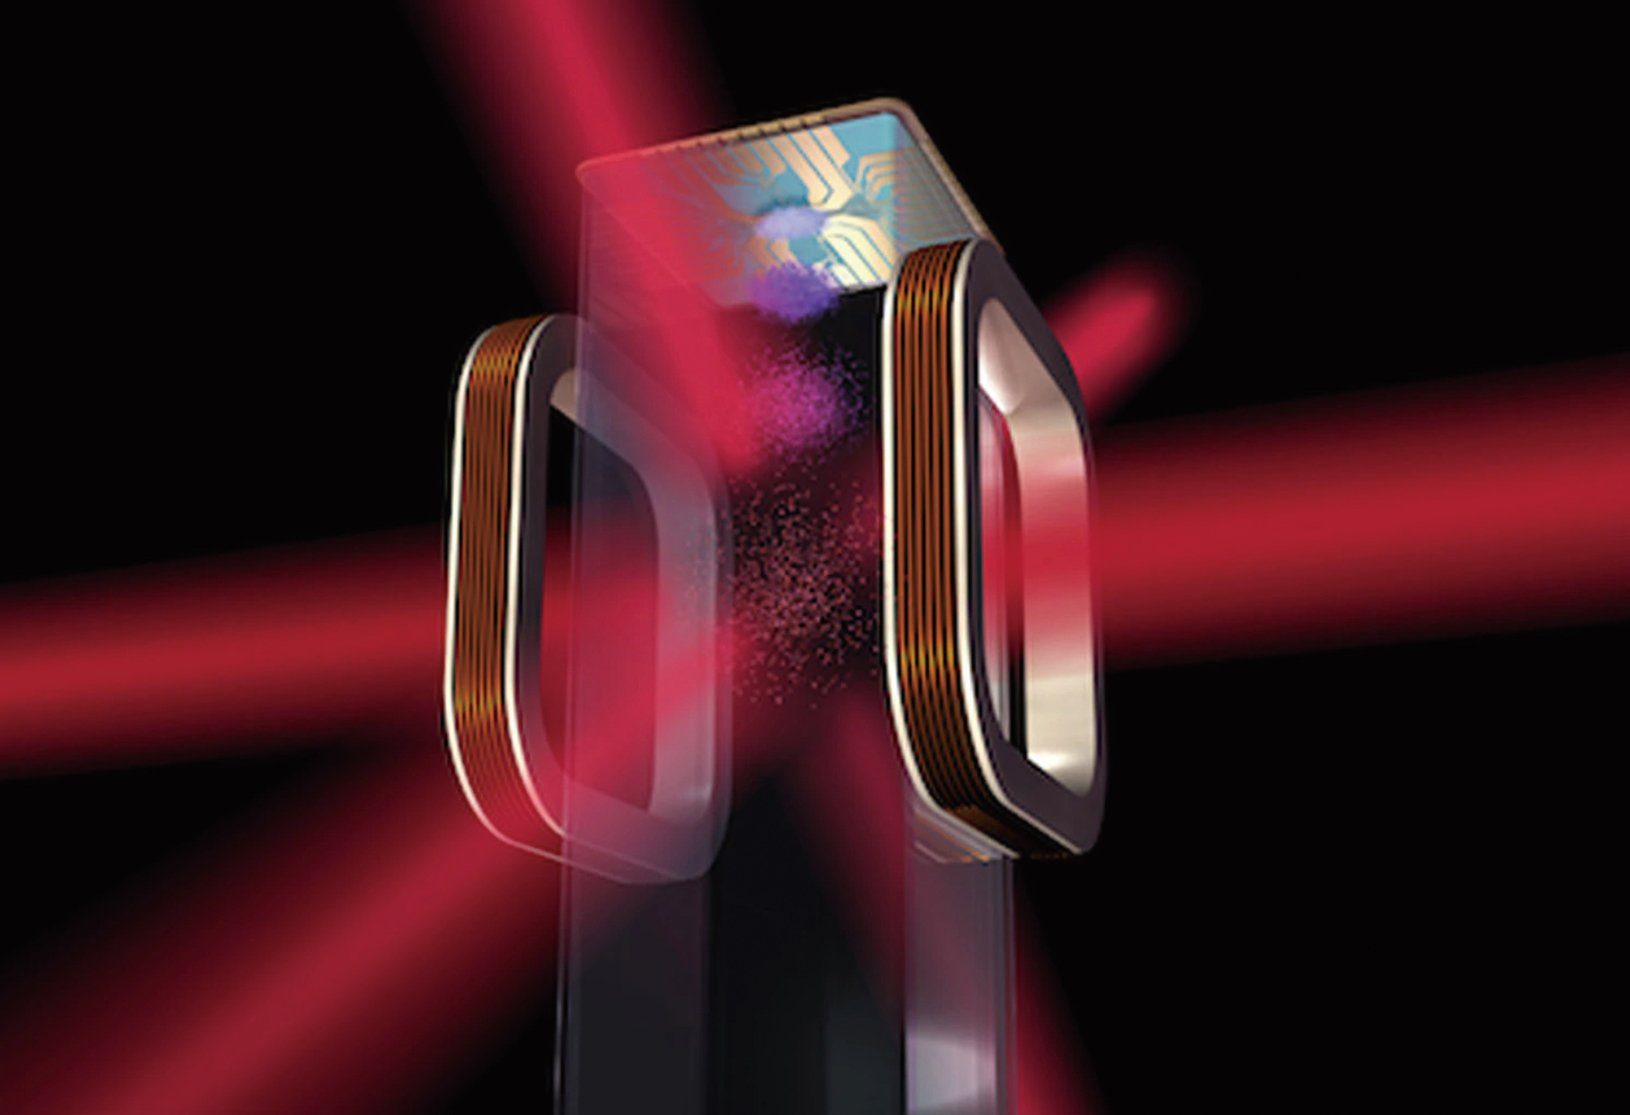 NASA在國際空間站利用激光產生超低溫的示意圖。(NASA)